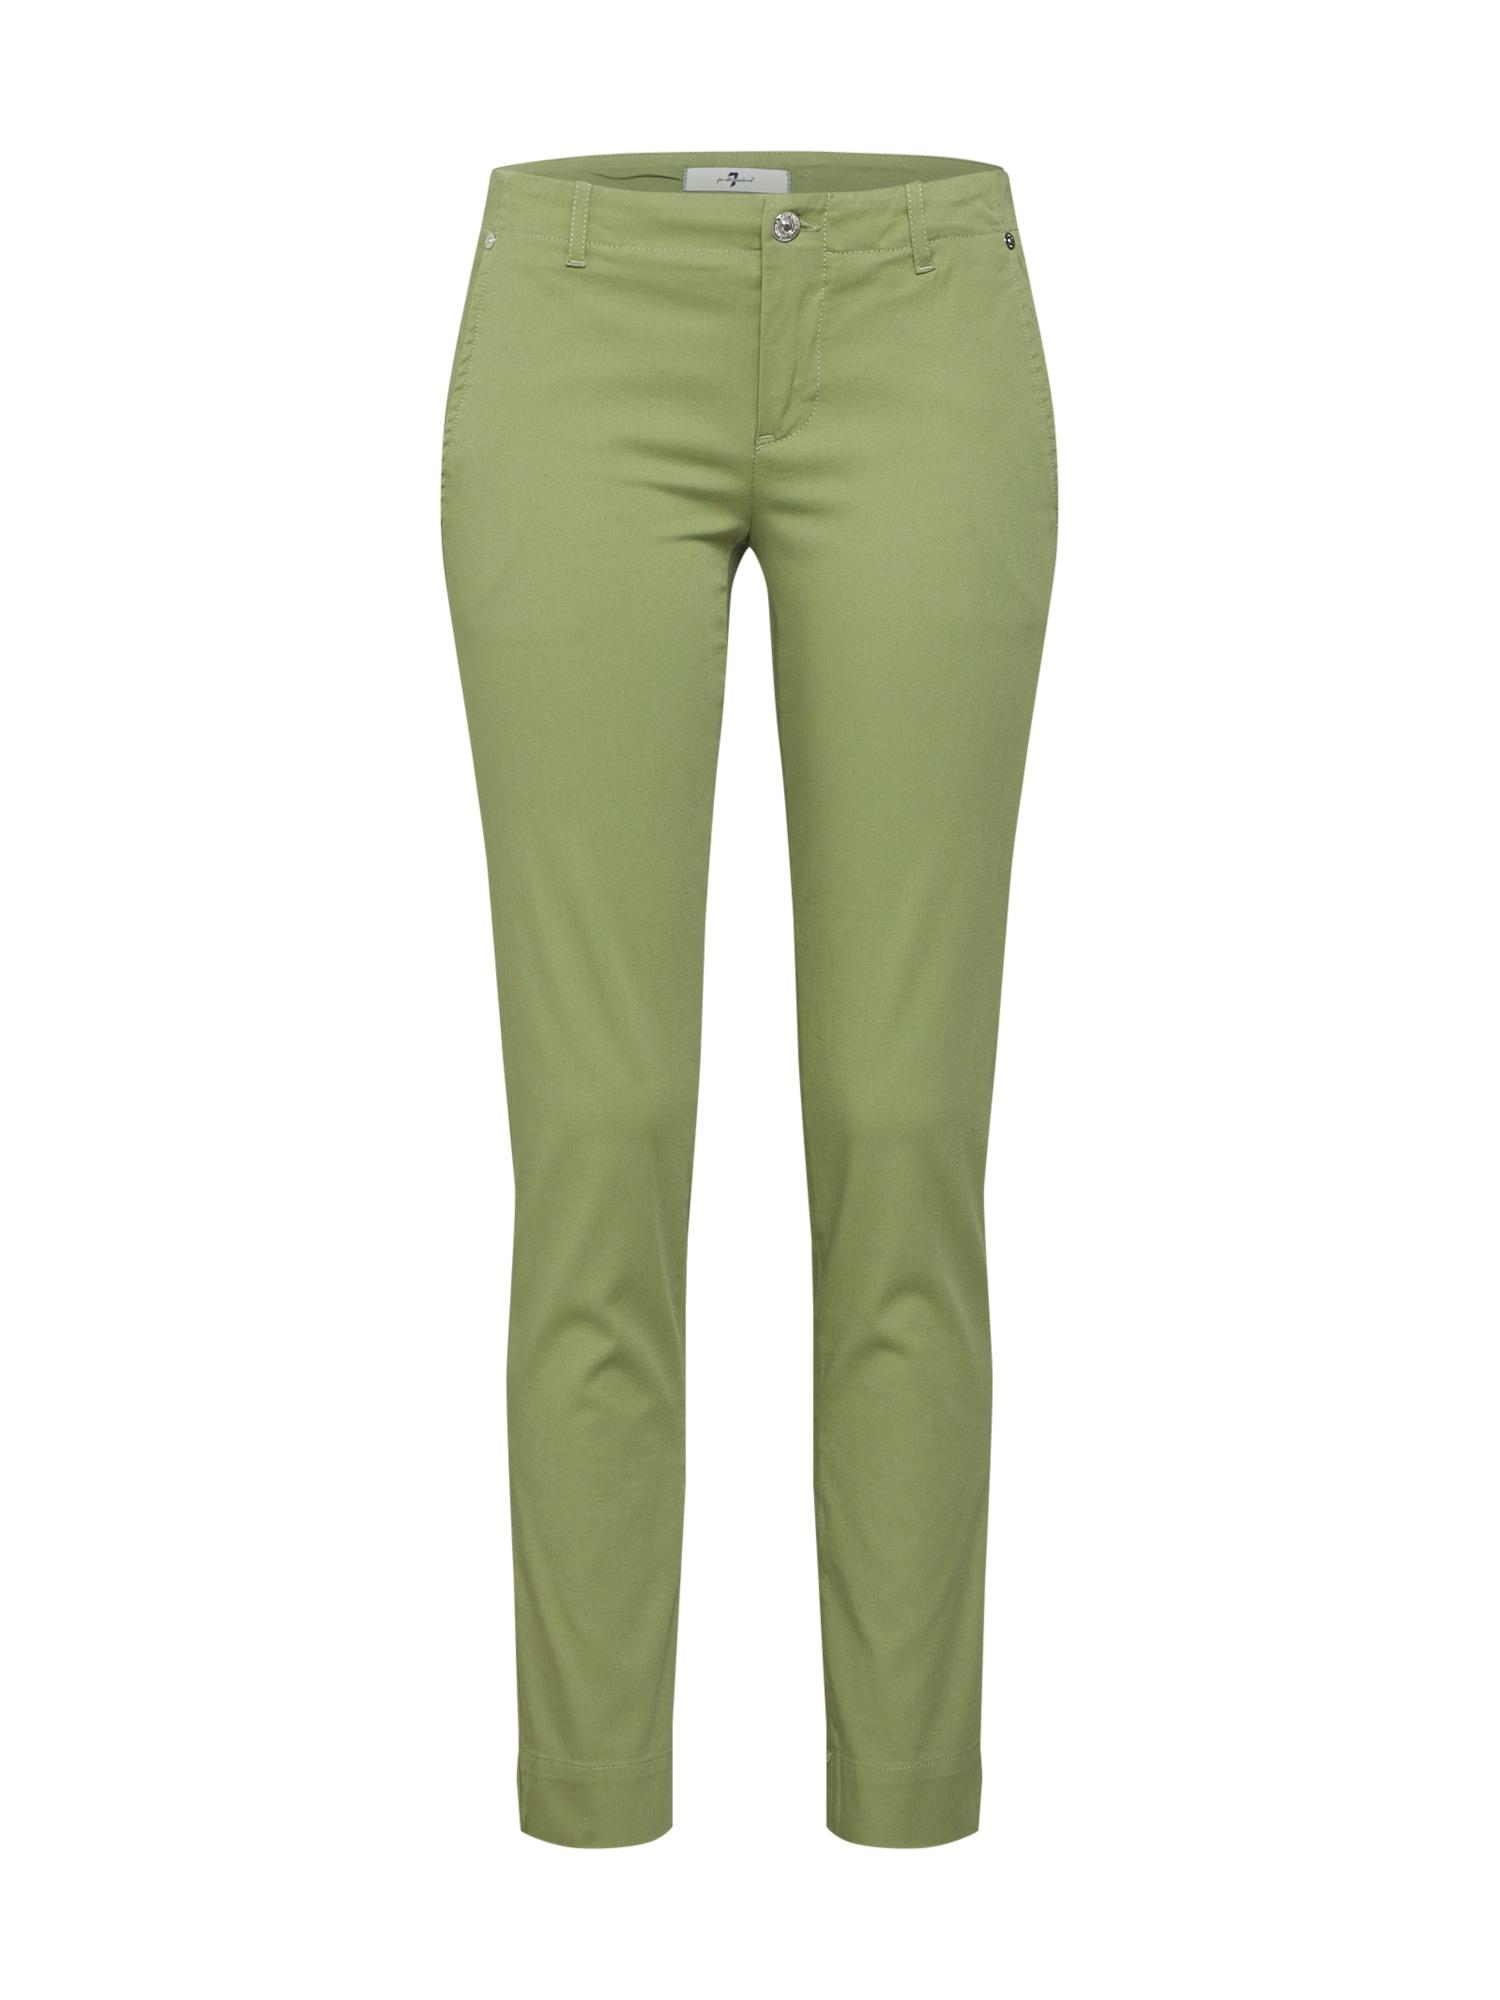 Chino kalhoty Pyper zelená 7 For All Mankind